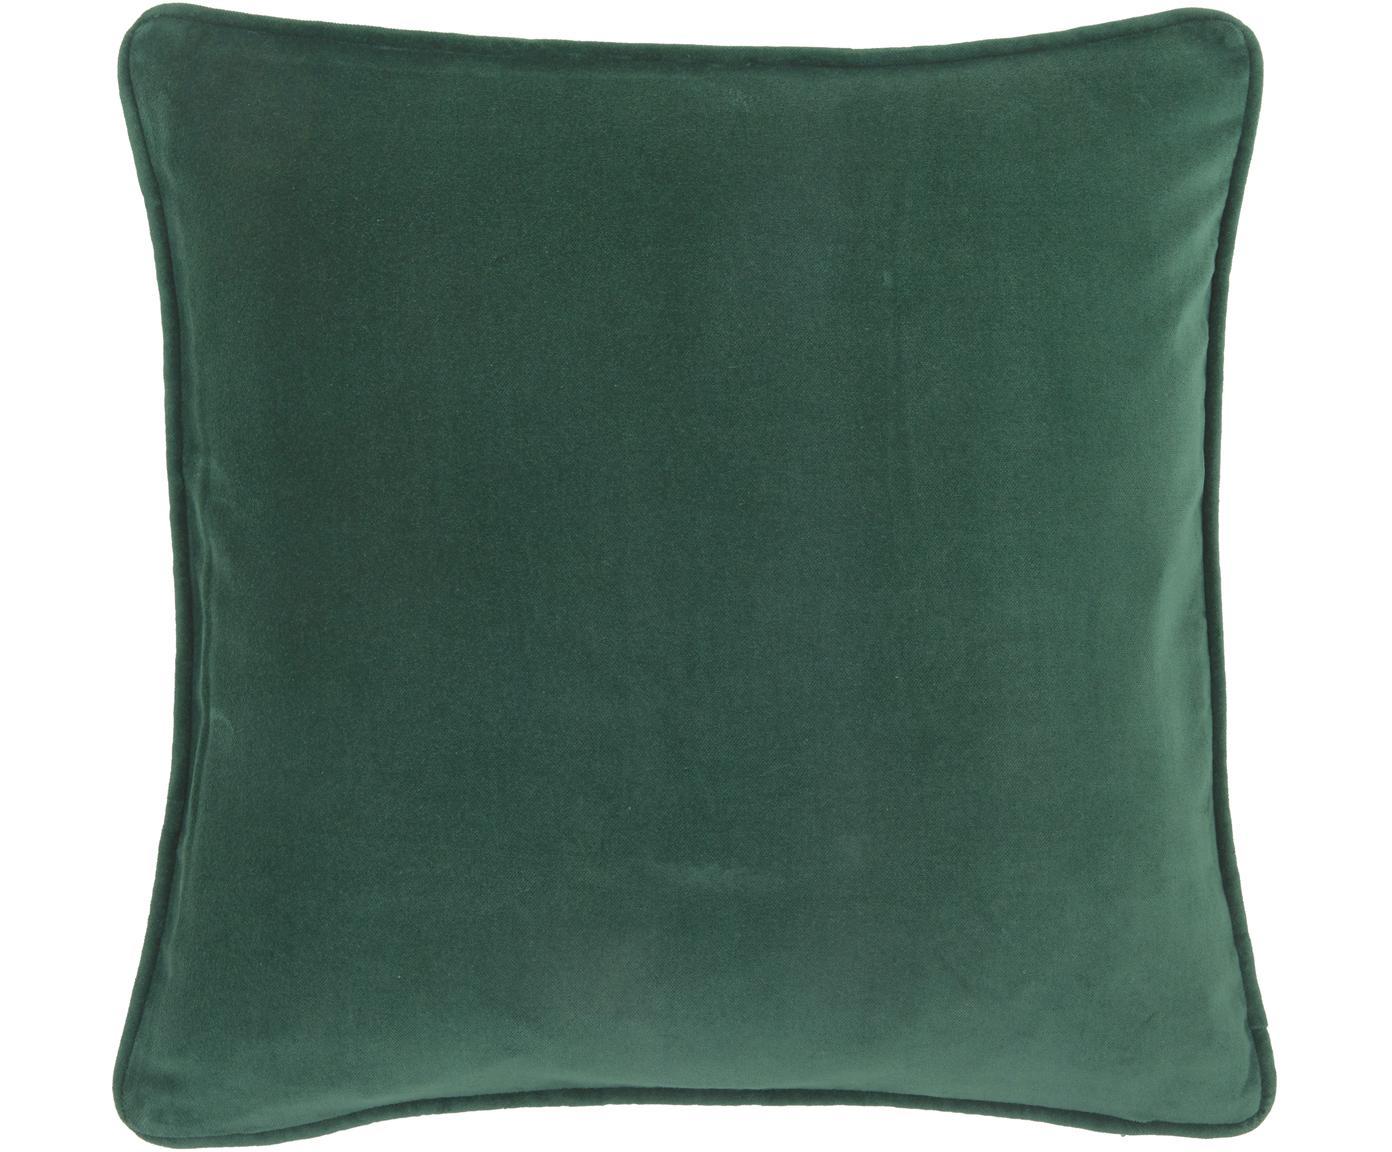 Effen fluwelen kussenhoes Dana in smaragdgroen, Katoenfluweel, Smaragdgroen, 50 x 50 cm